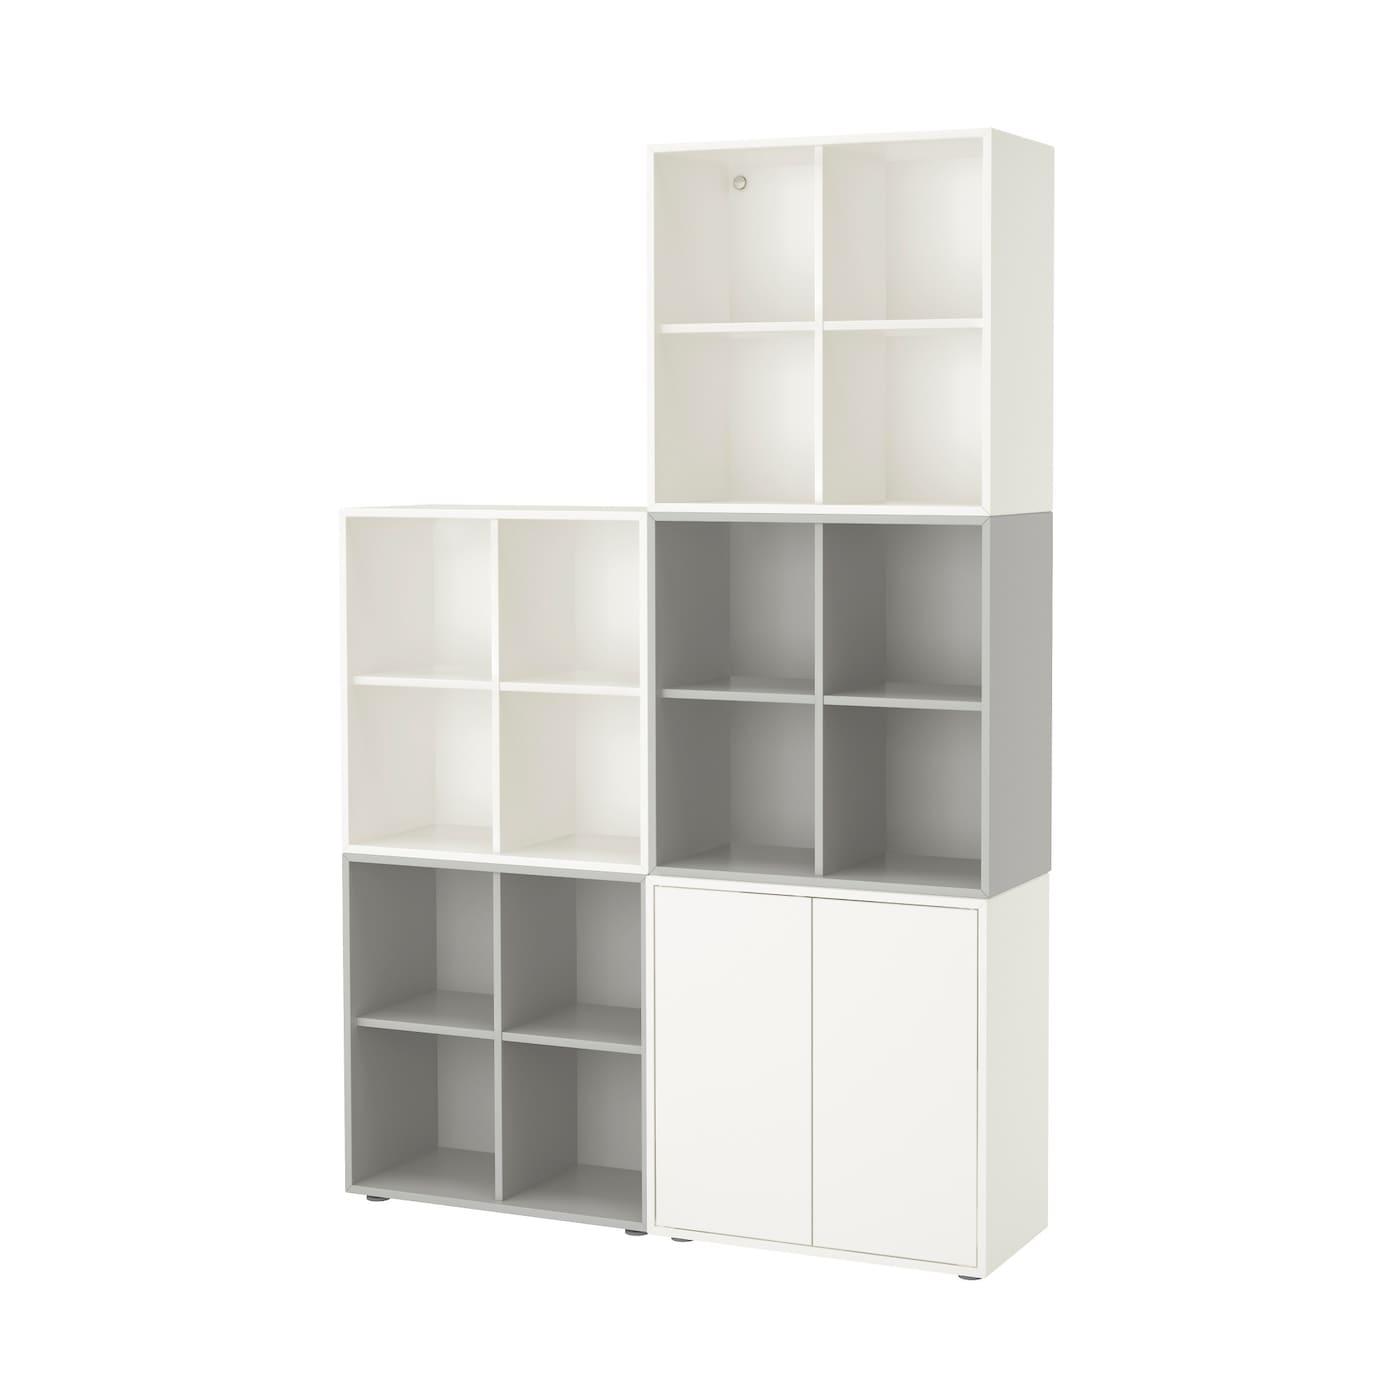 eket cabinet combination with feet white light grey 140 x 35 x 212 cm ikea. Black Bedroom Furniture Sets. Home Design Ideas